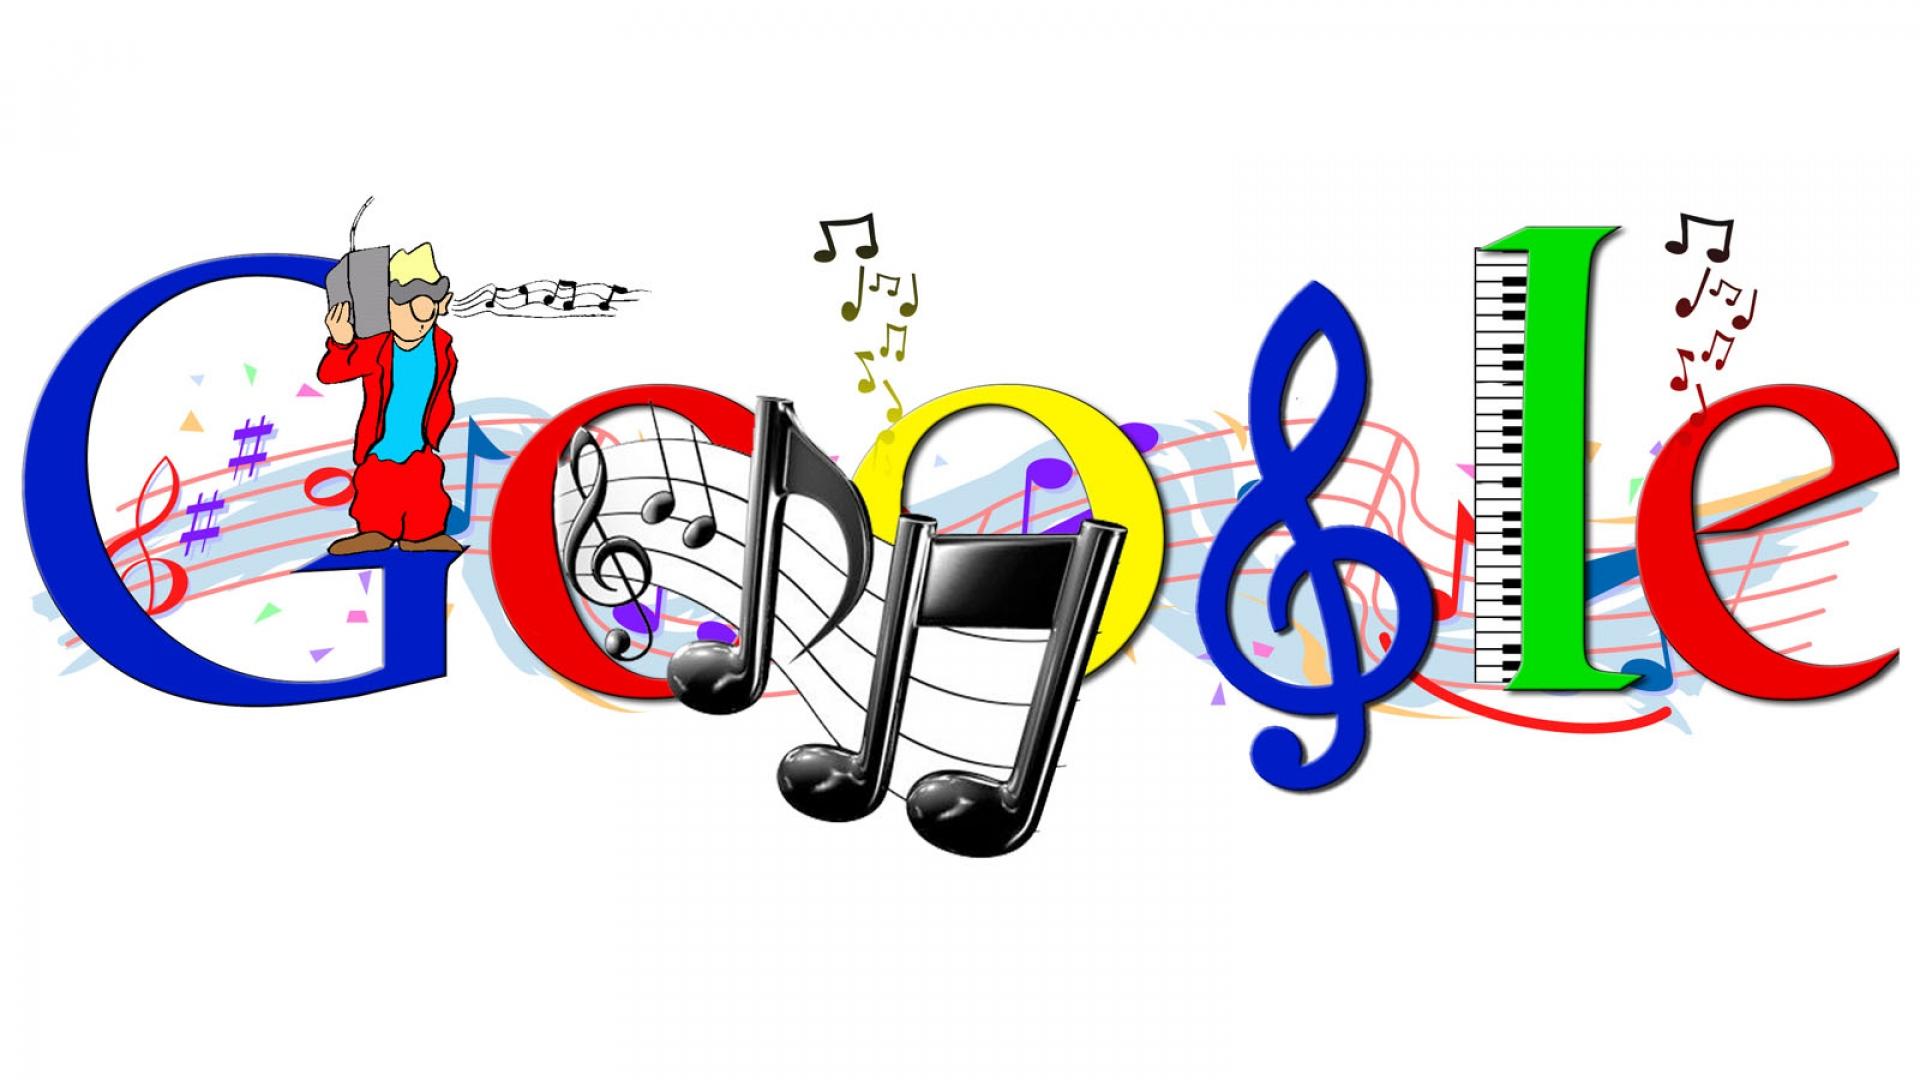 Google themes themebeta - Google Themes Themebeta 37